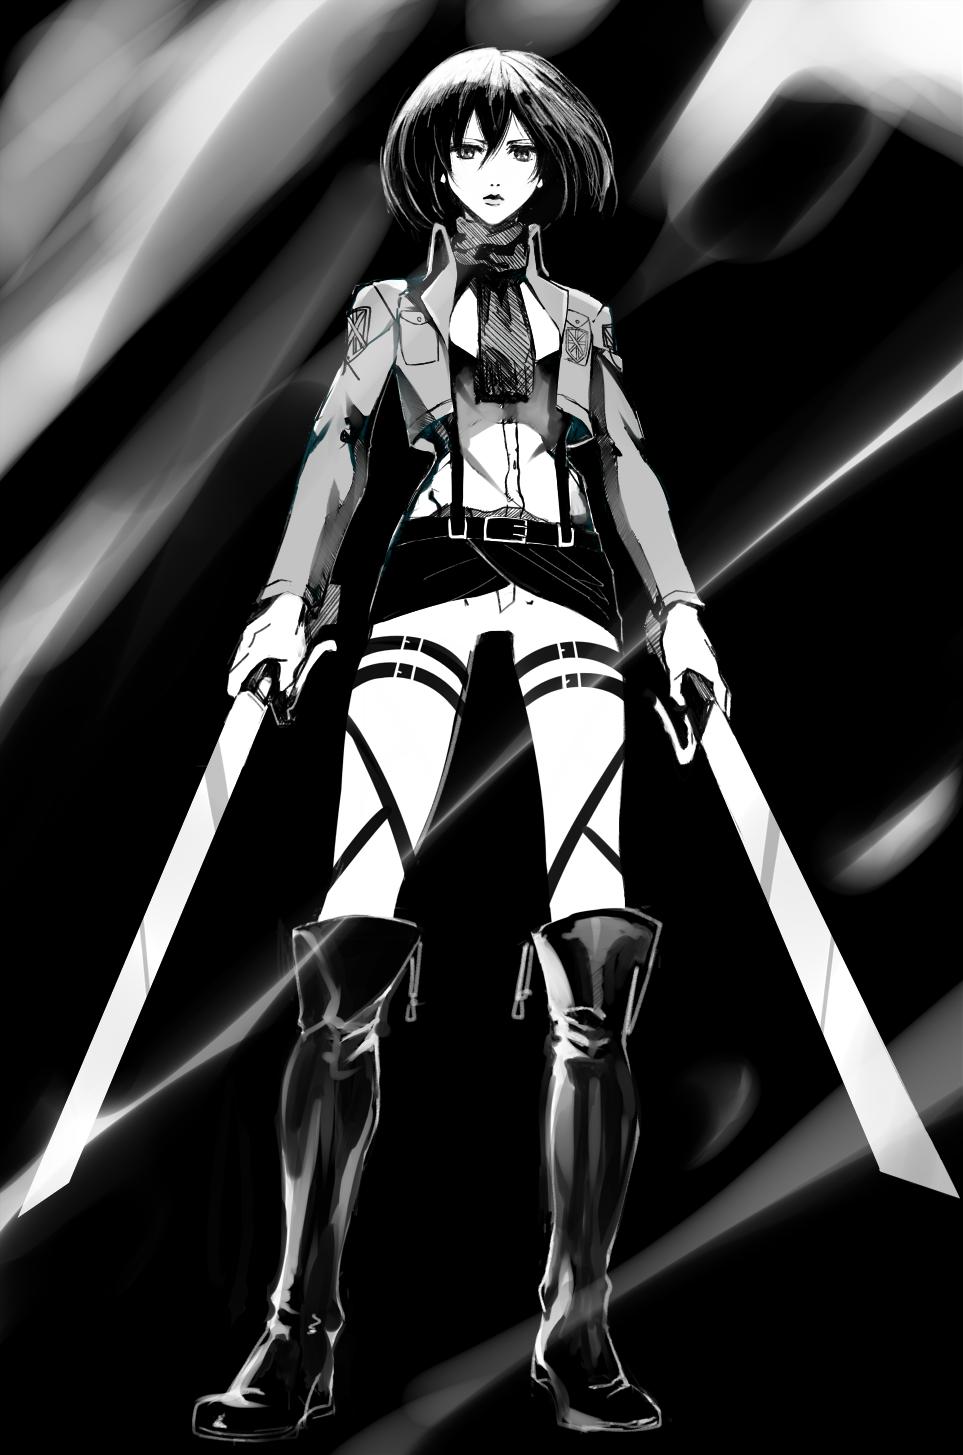 Super Heroine by Beardorado